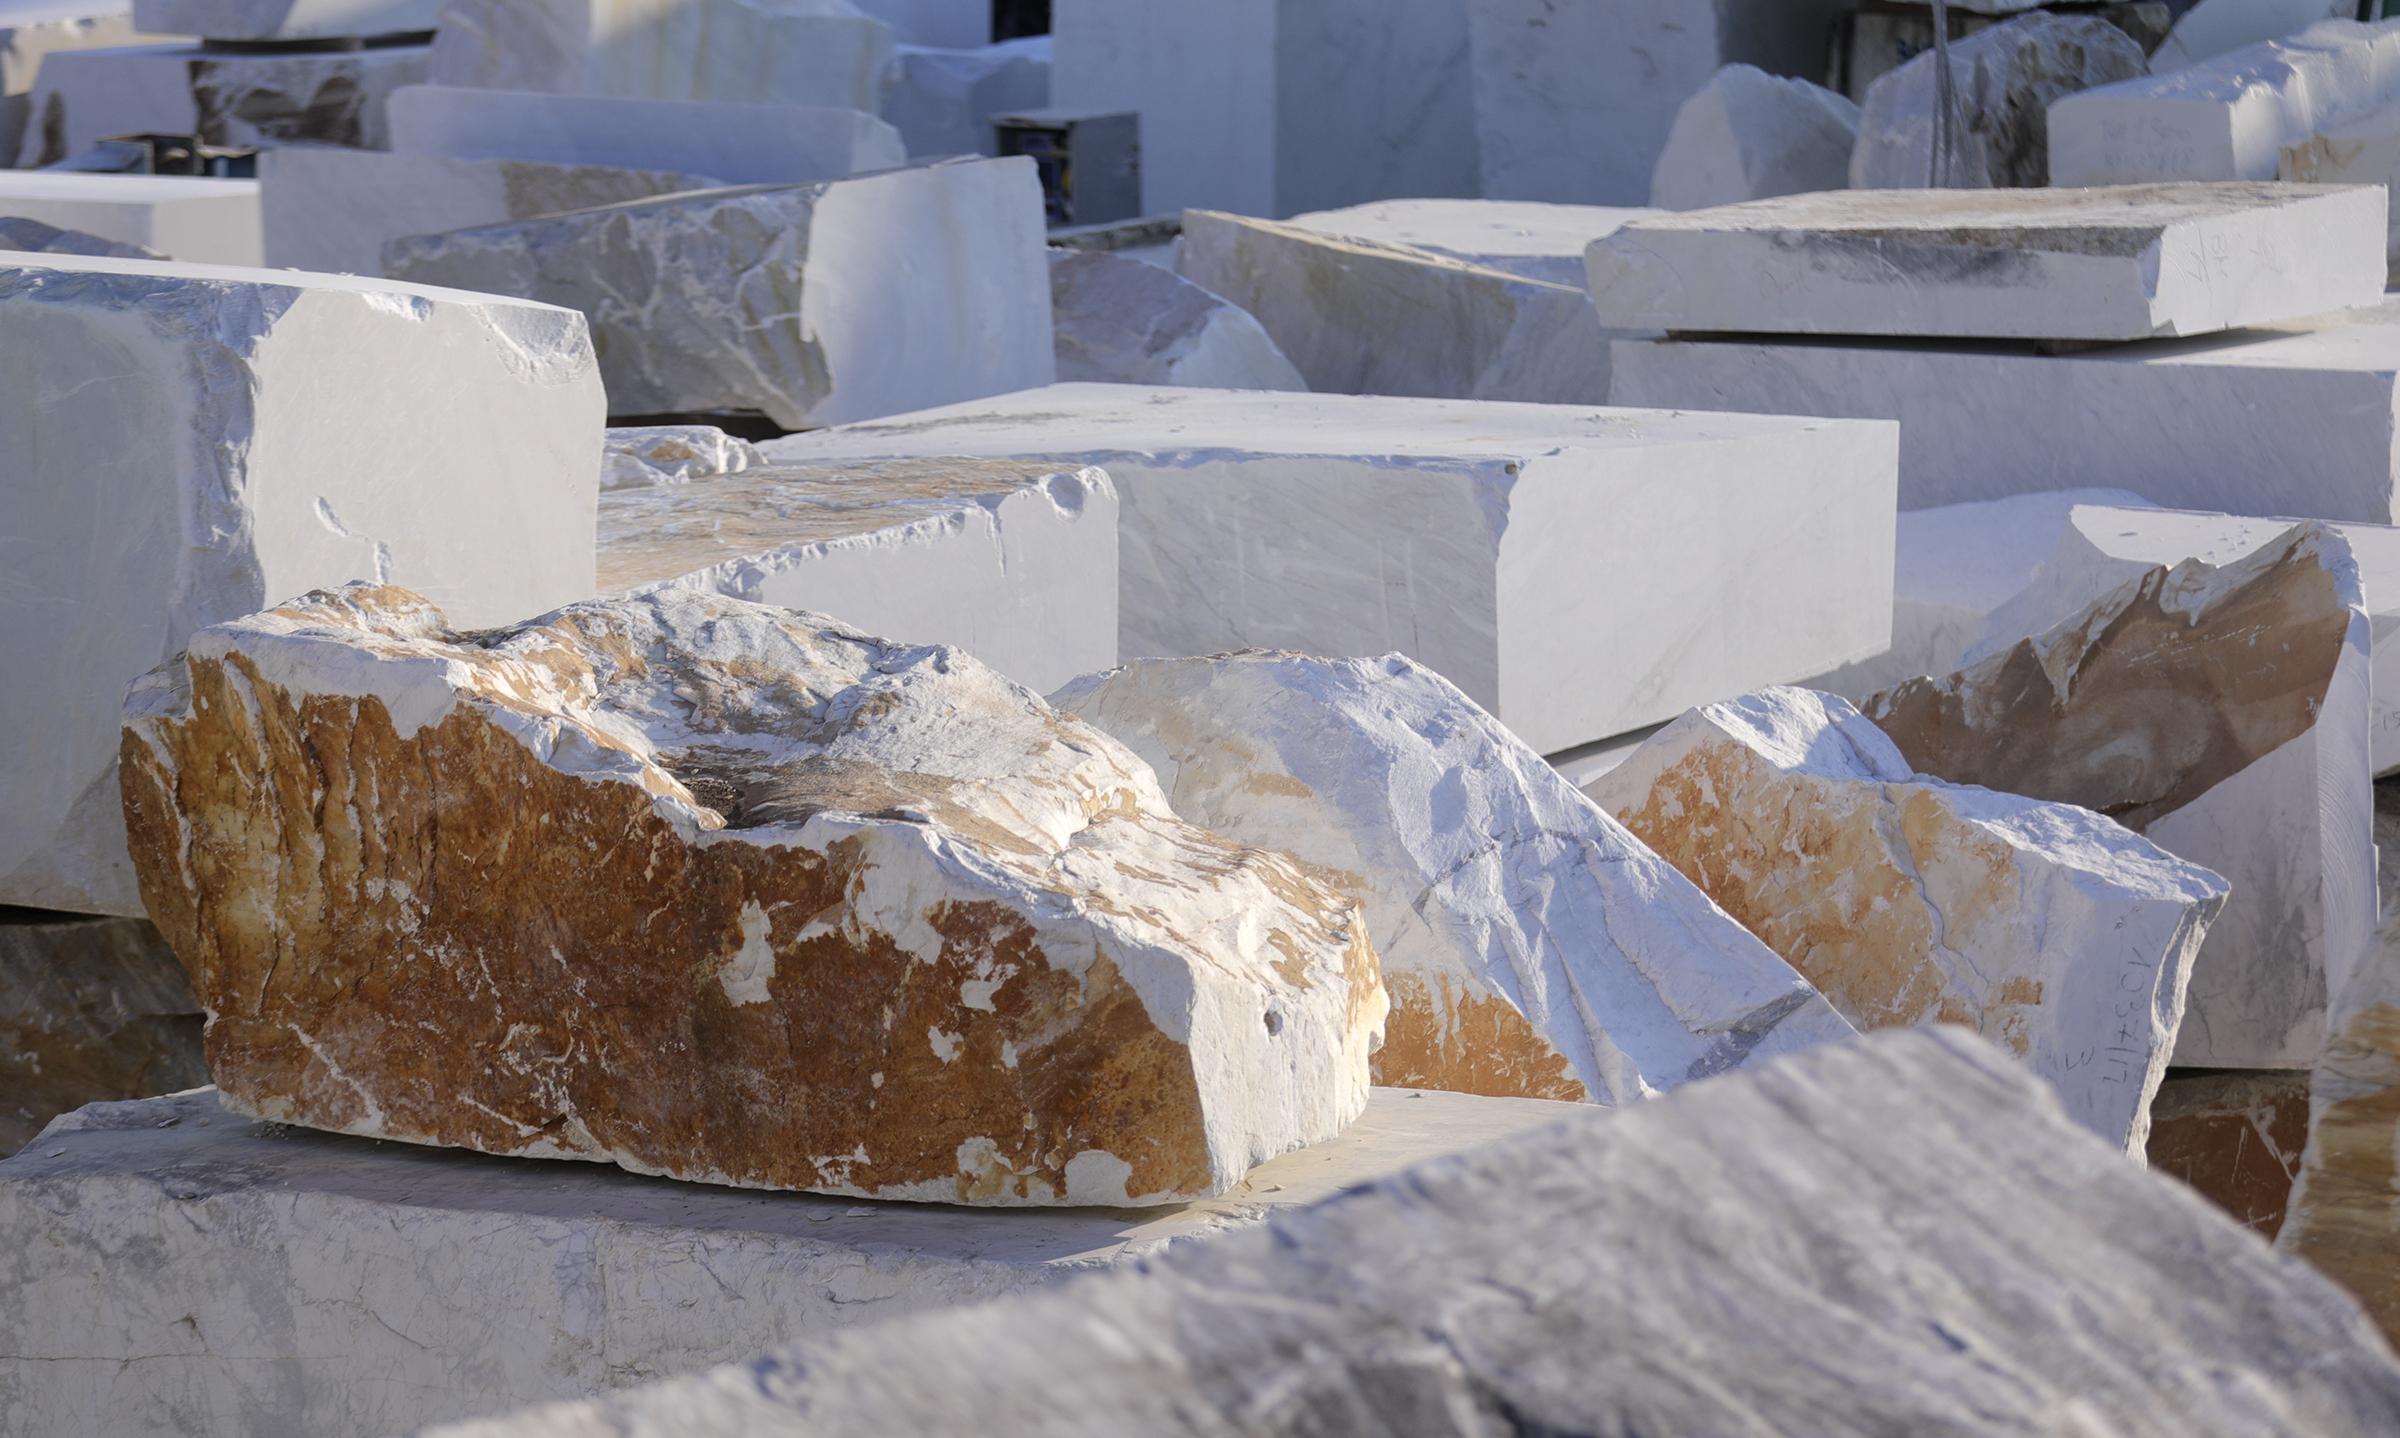 Blocks of marble in Carrara, Italy, on Thursday, Nov. 15, 2018.